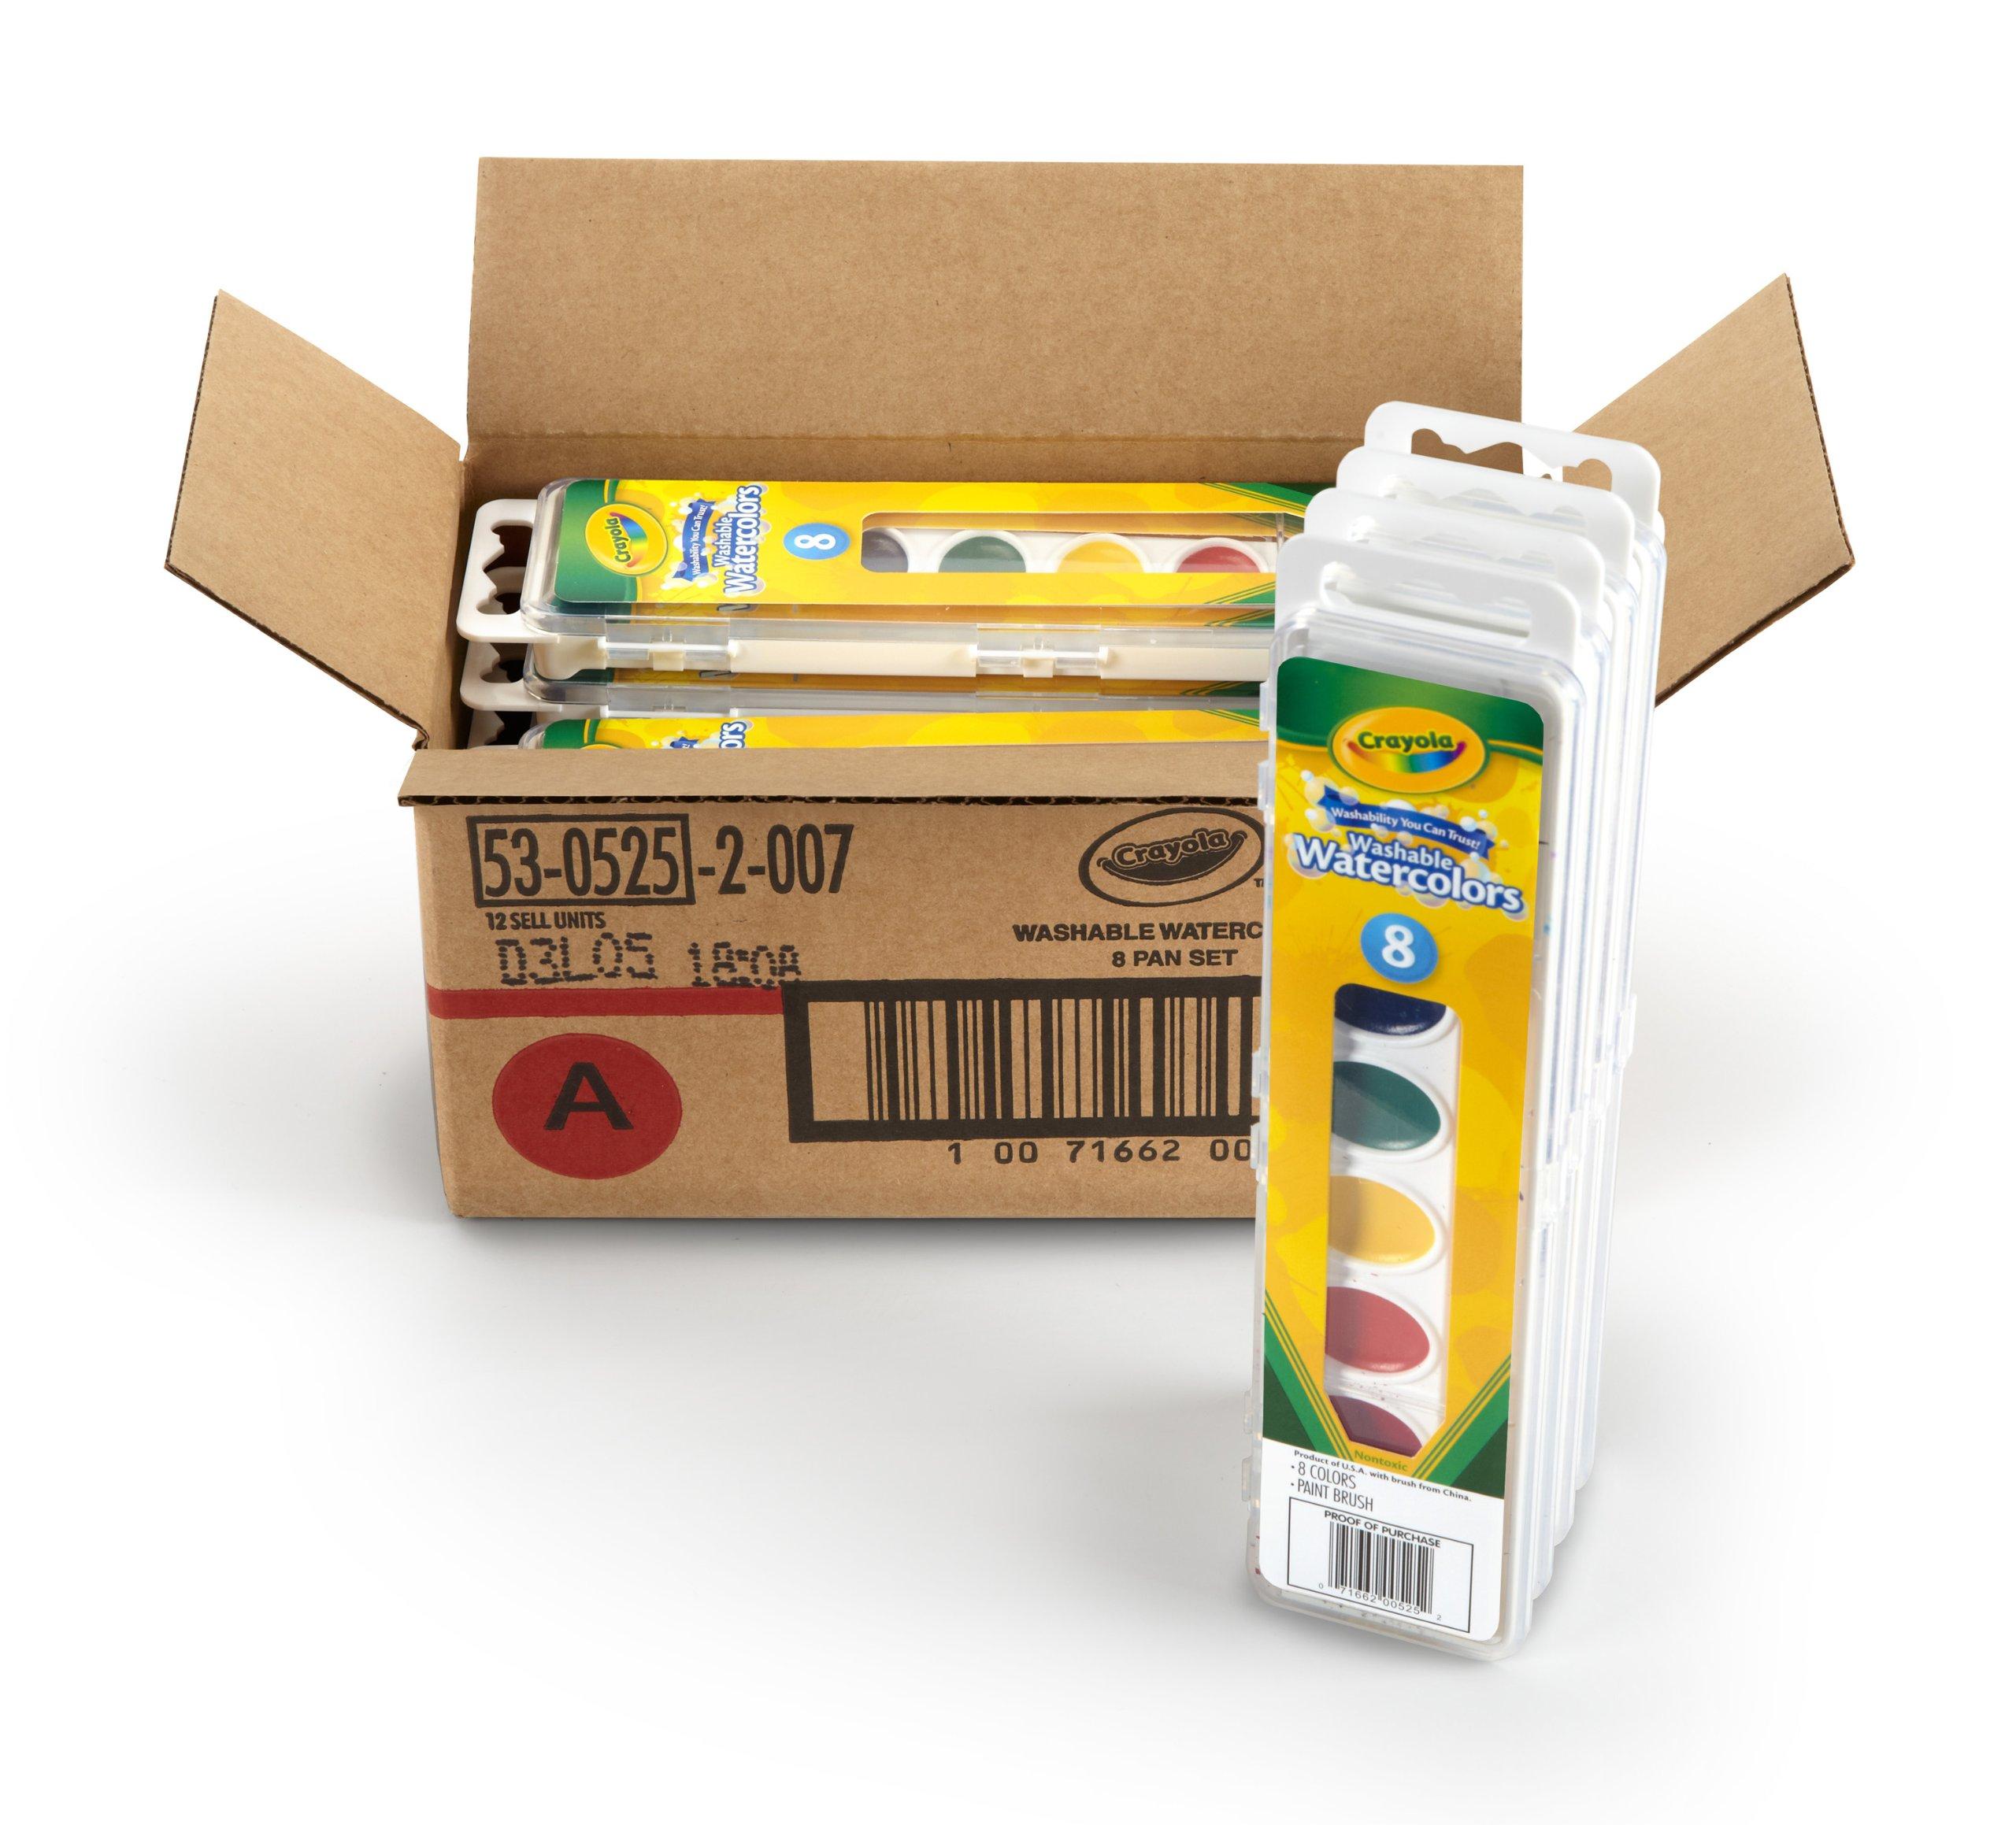 Crayola 53-0525-1 8 Pan Set Washable Watercolors, 12 Pack by Crayola